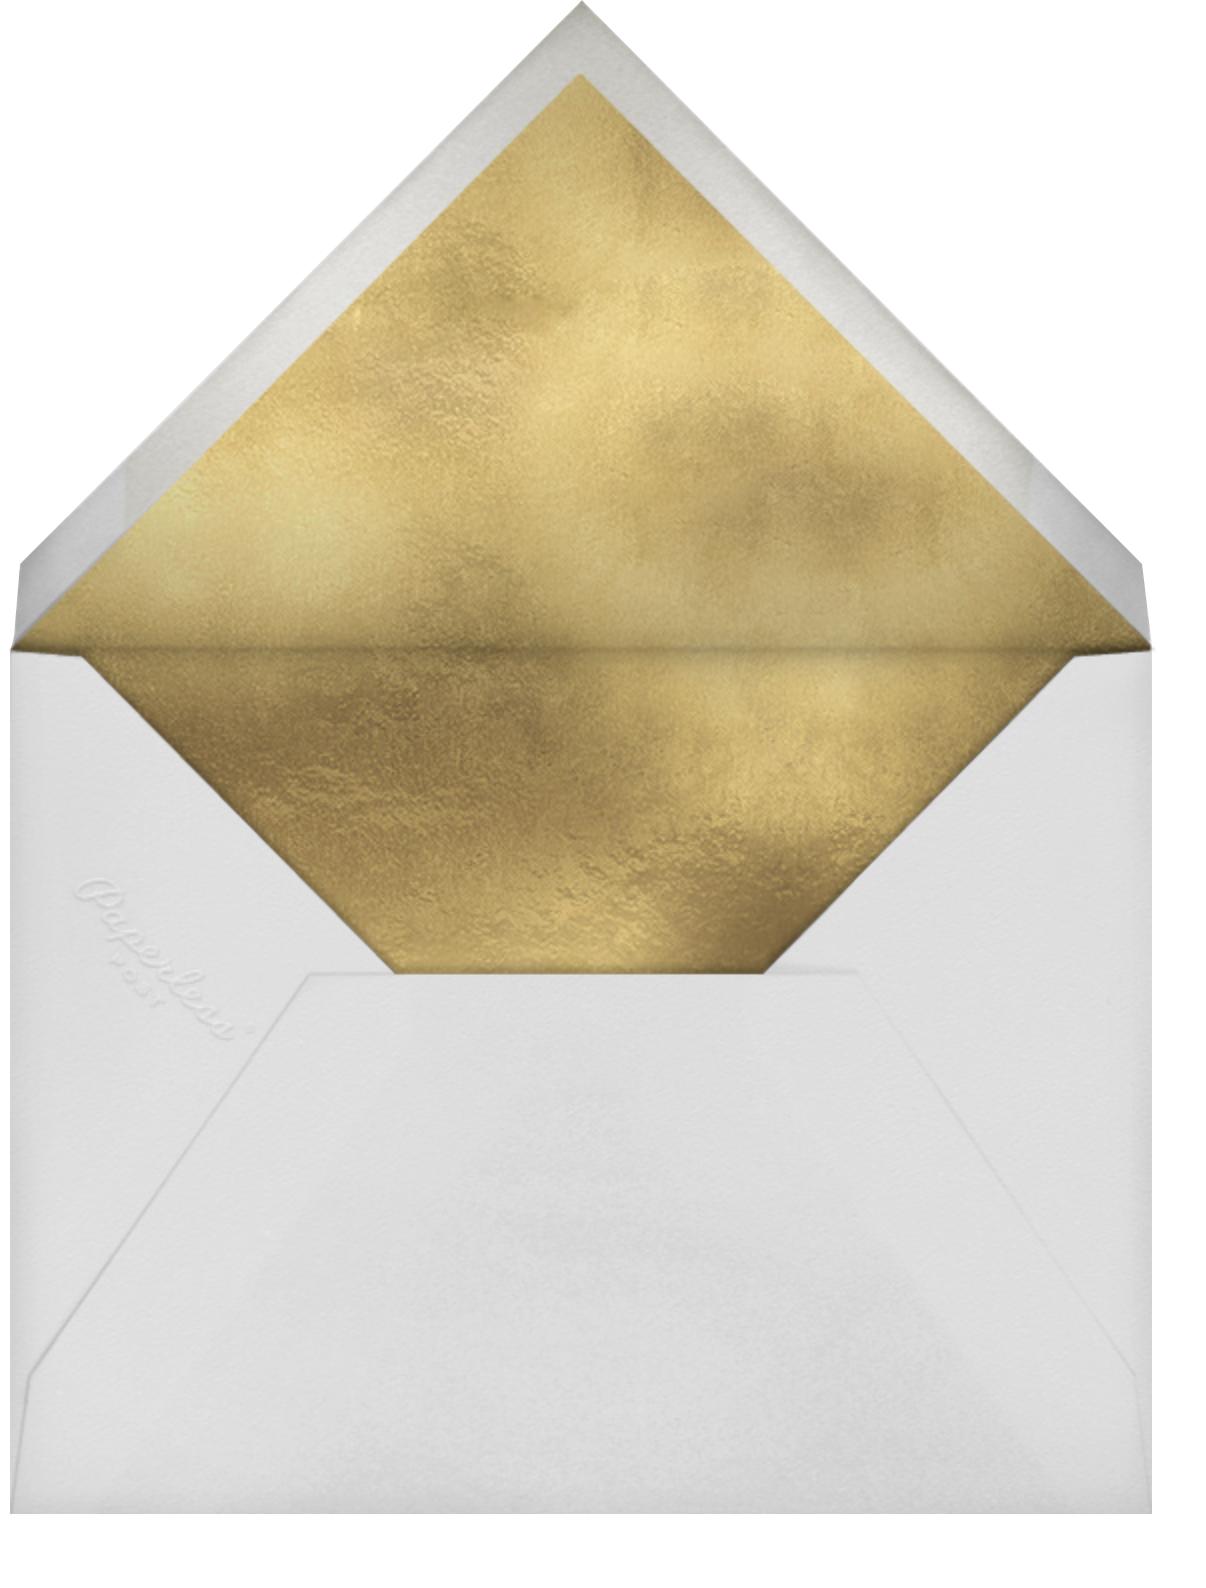 Gold Unikko Photo - Marimekko - Adult birthday - envelope back